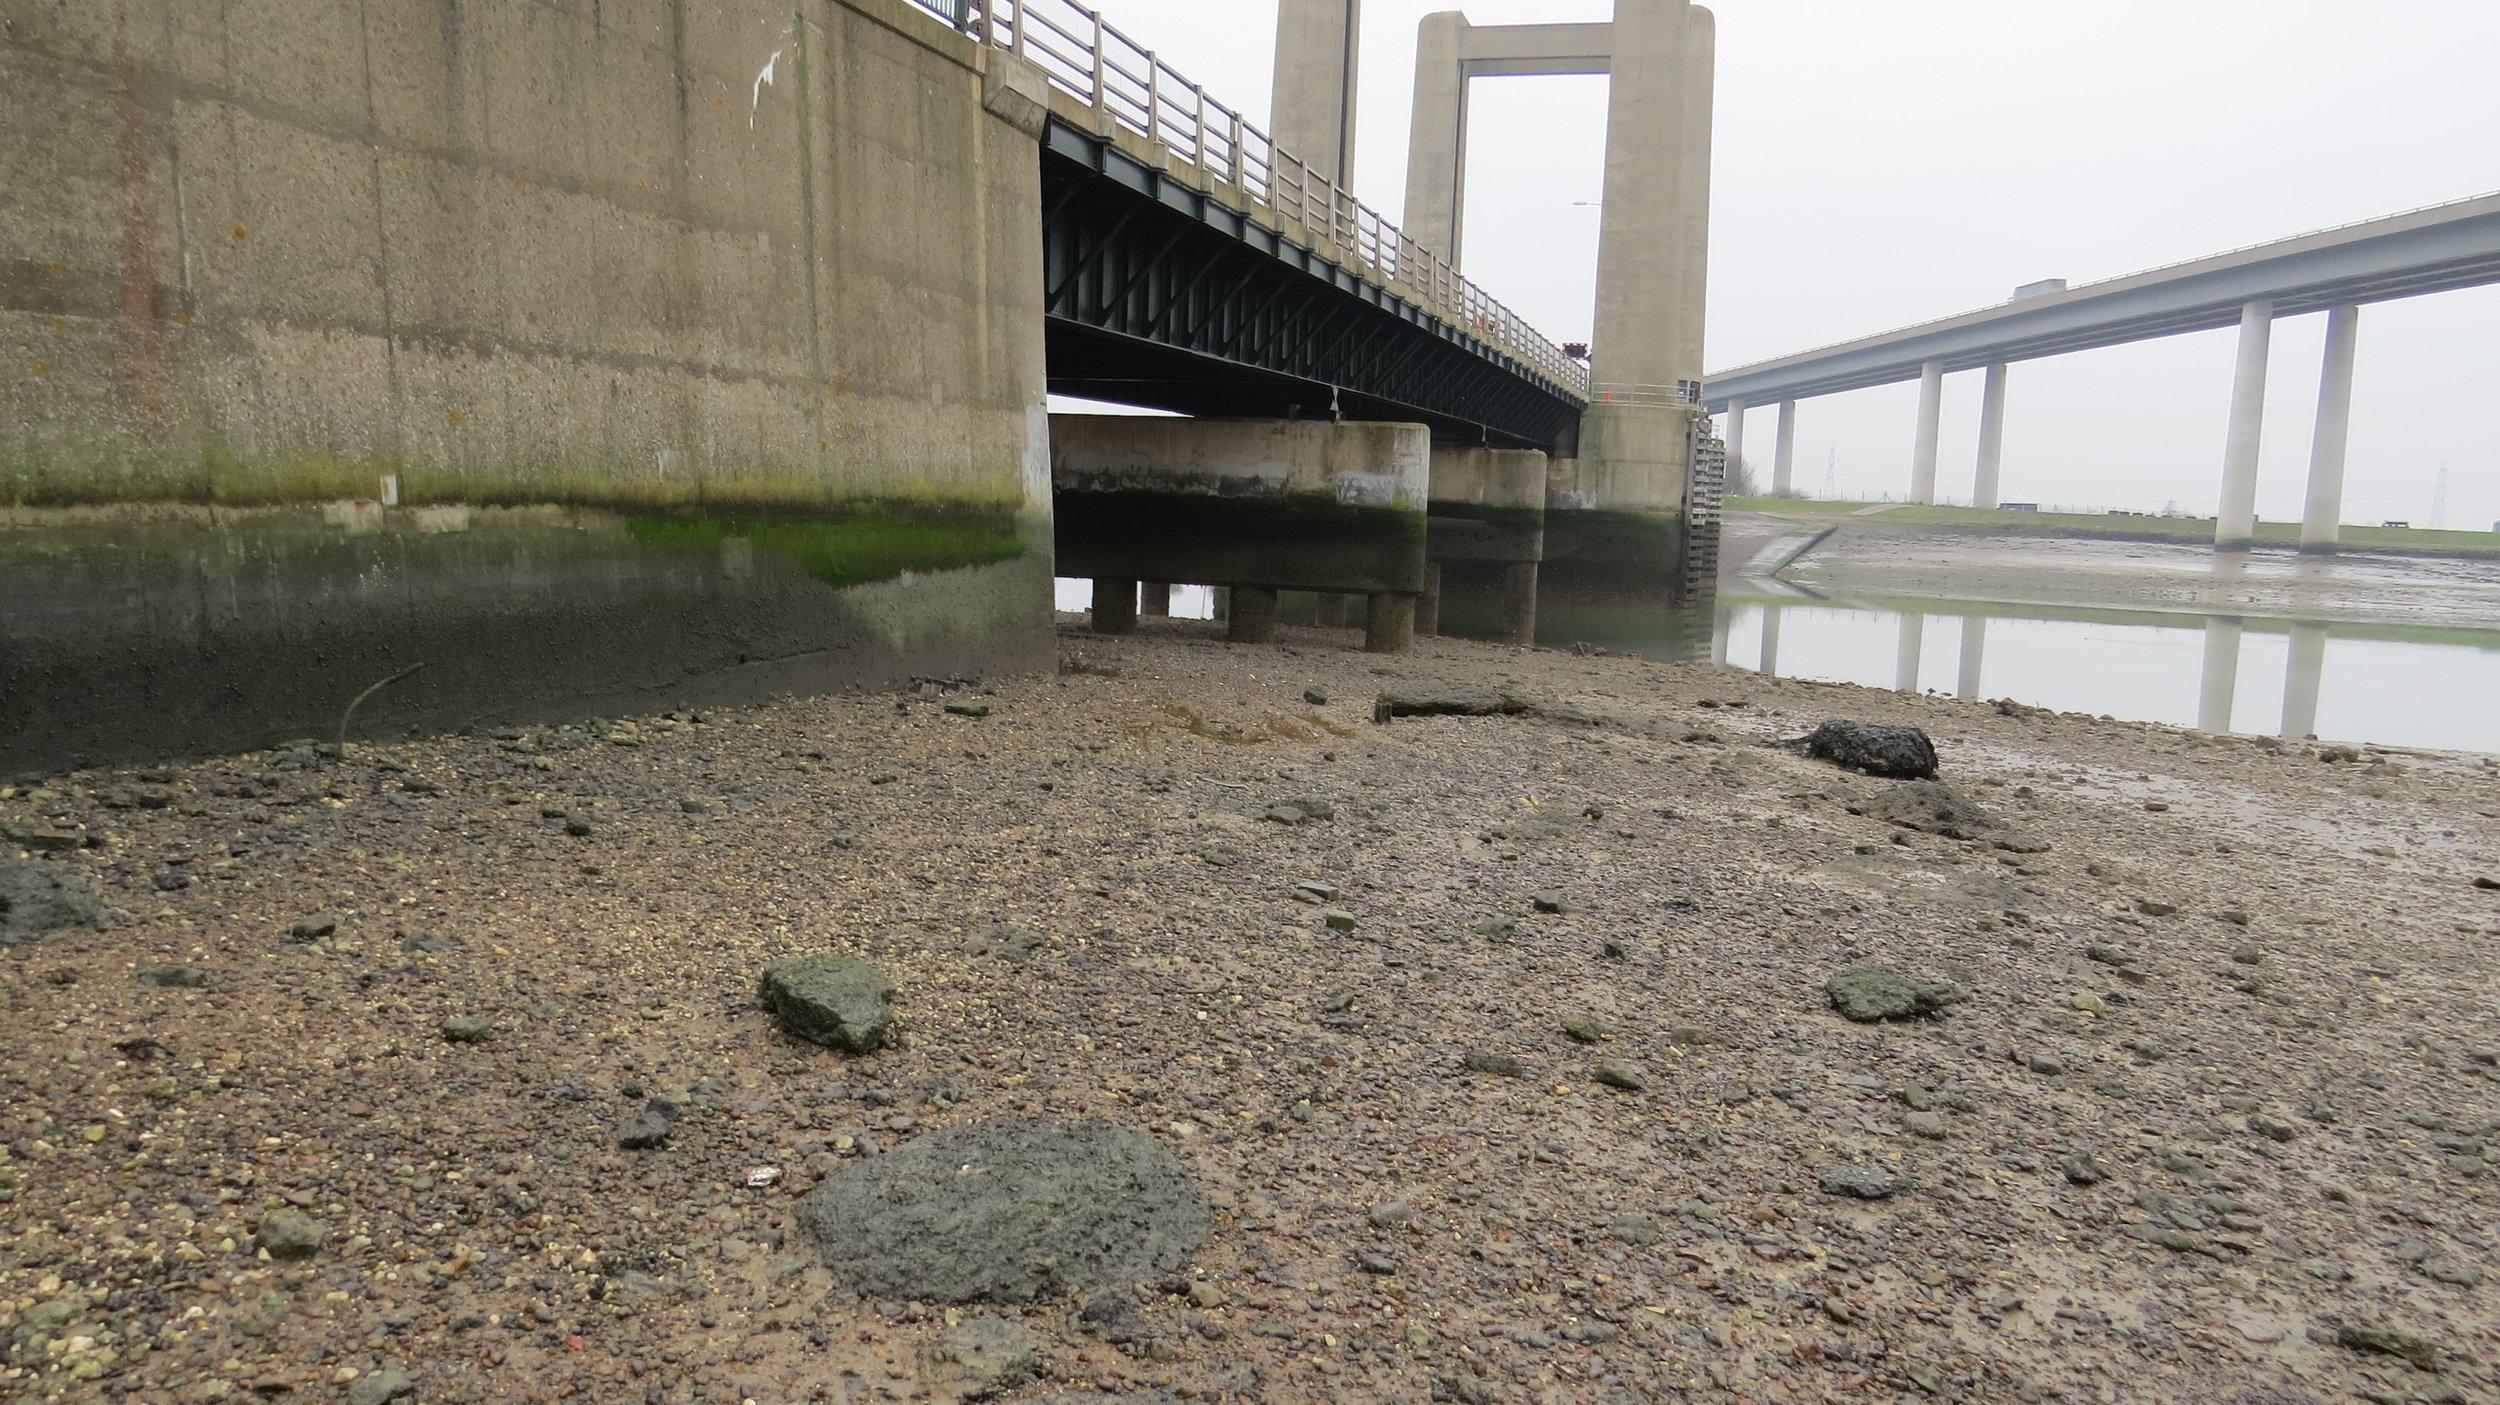 Sneaky route under bridge